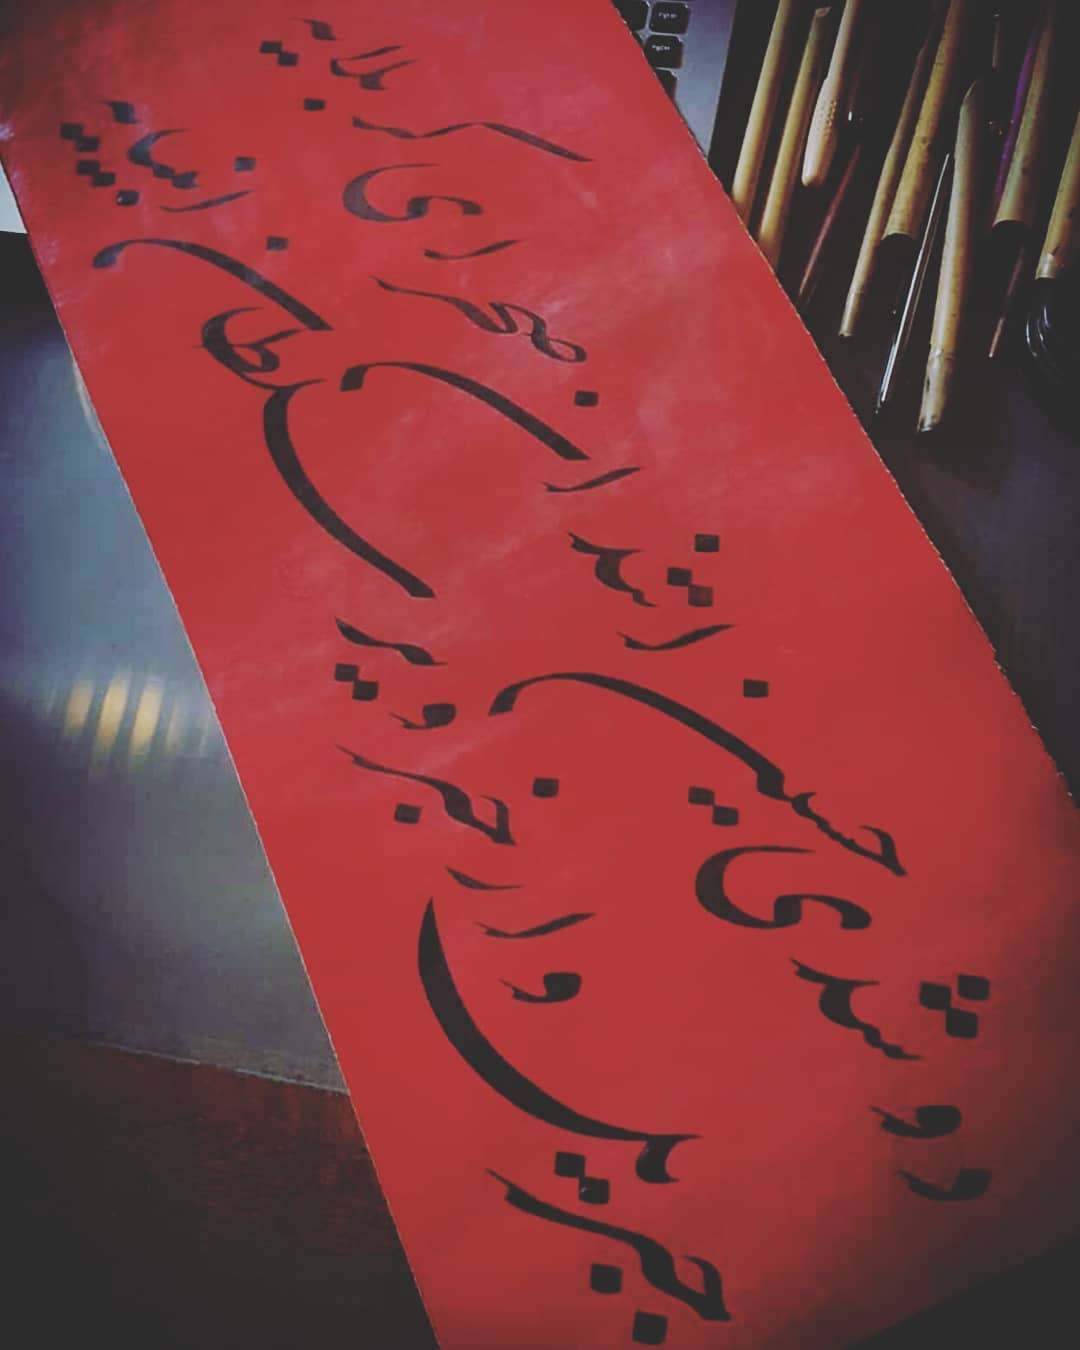 Donwload Photo Düştü Hüseyn atından sahra-ı Kerbelâ'ya  Cibril var haber ver Sultan-ı Enbiyâ'ya…- Hattat Mahmud